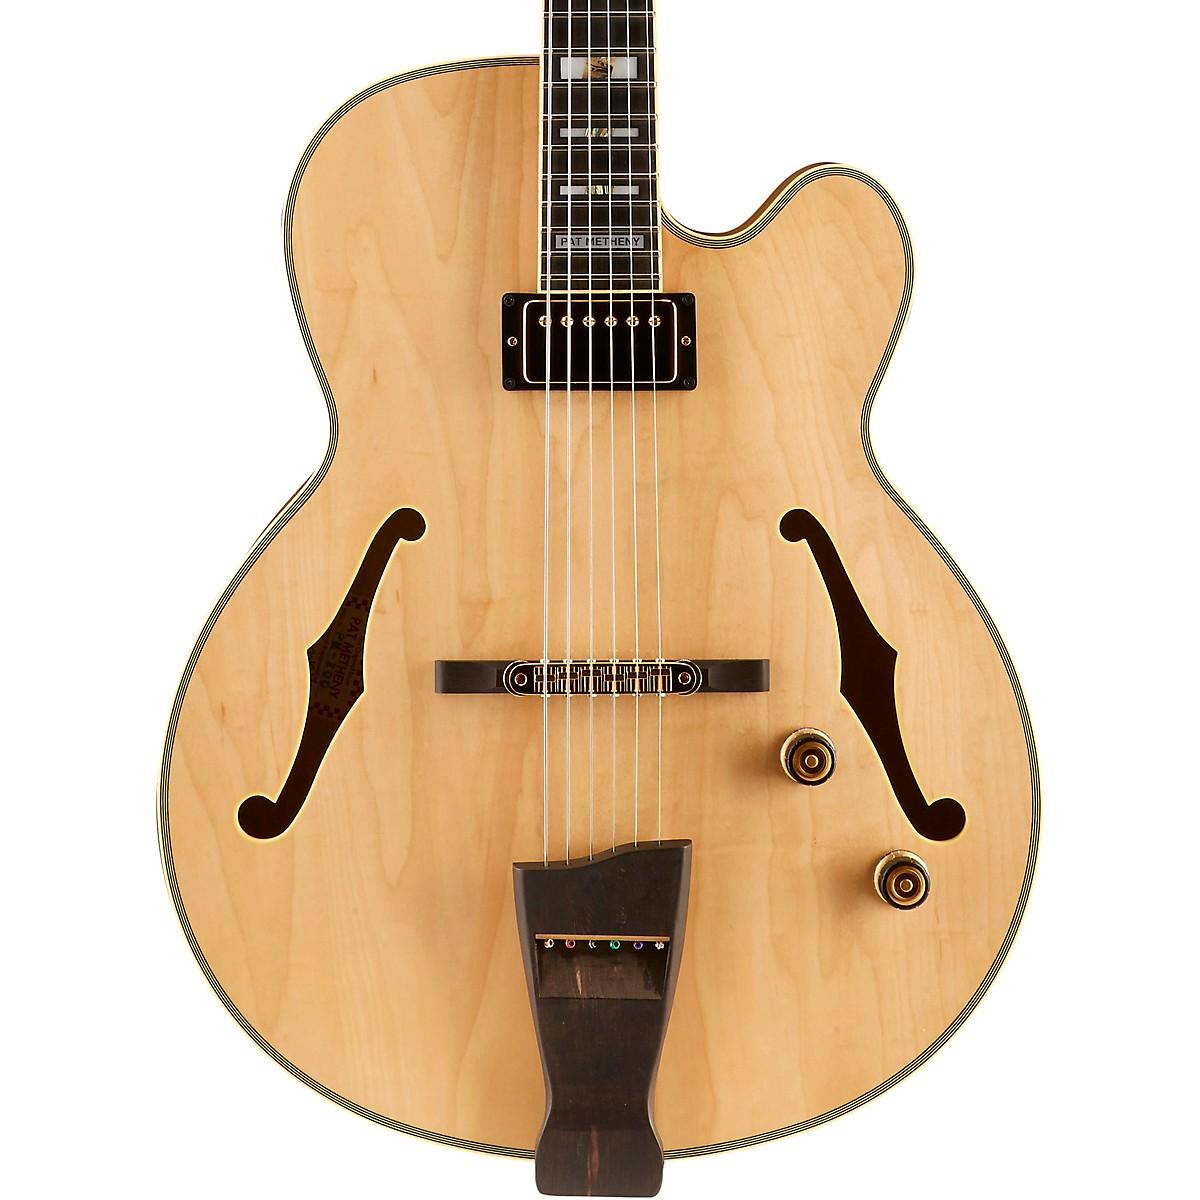 Ibanez PM200 Pat Metheny Signature Hollowbody Electric Guitar